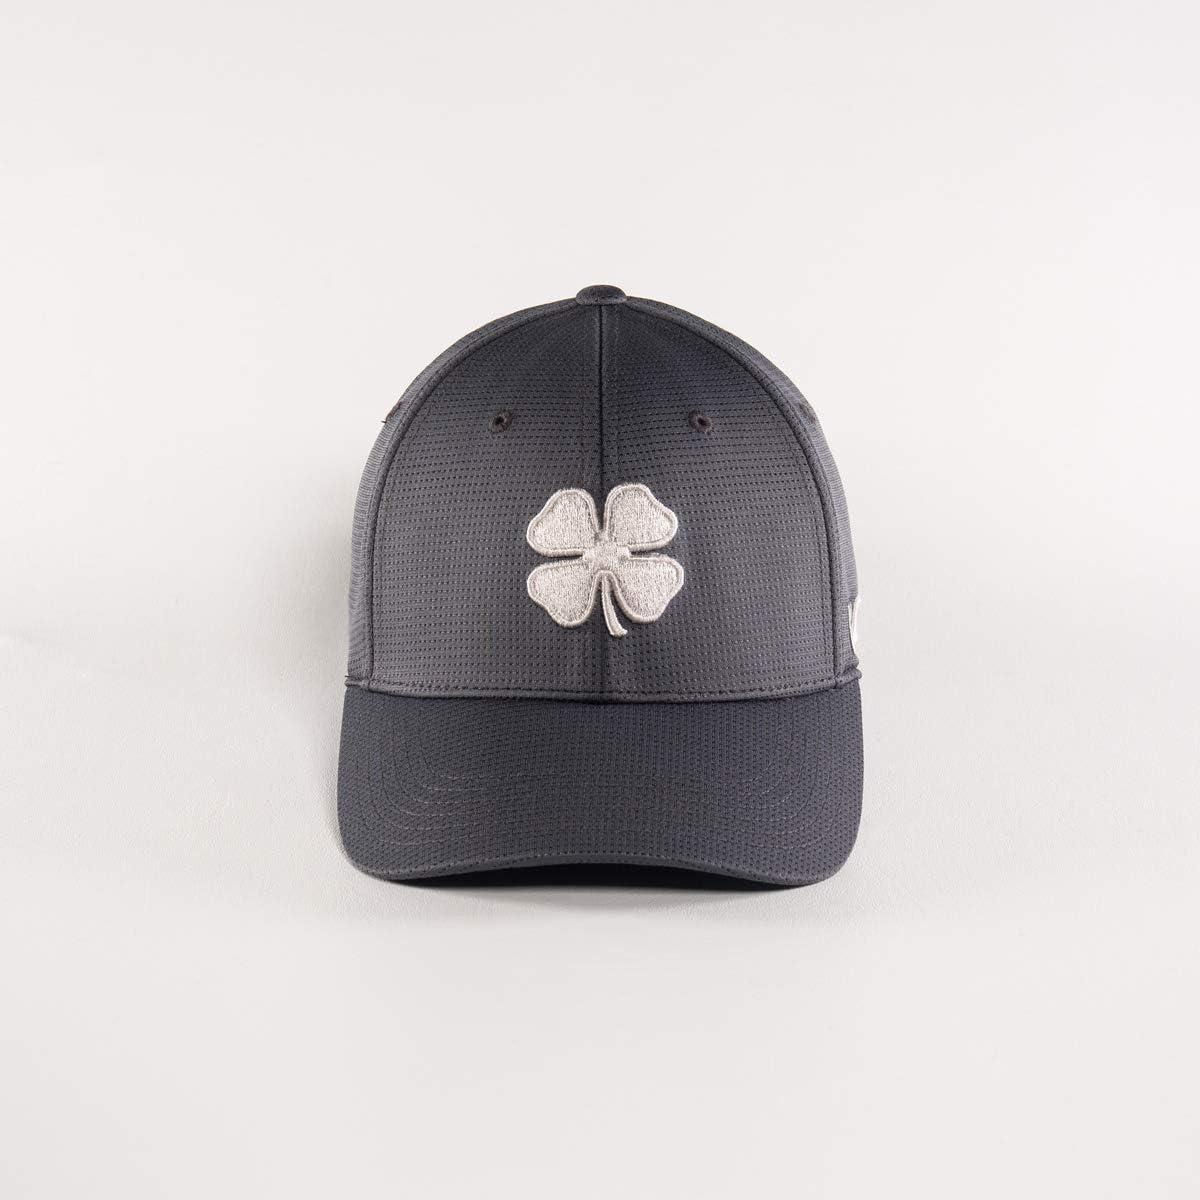 Black Clover Iron X Olympic Hat